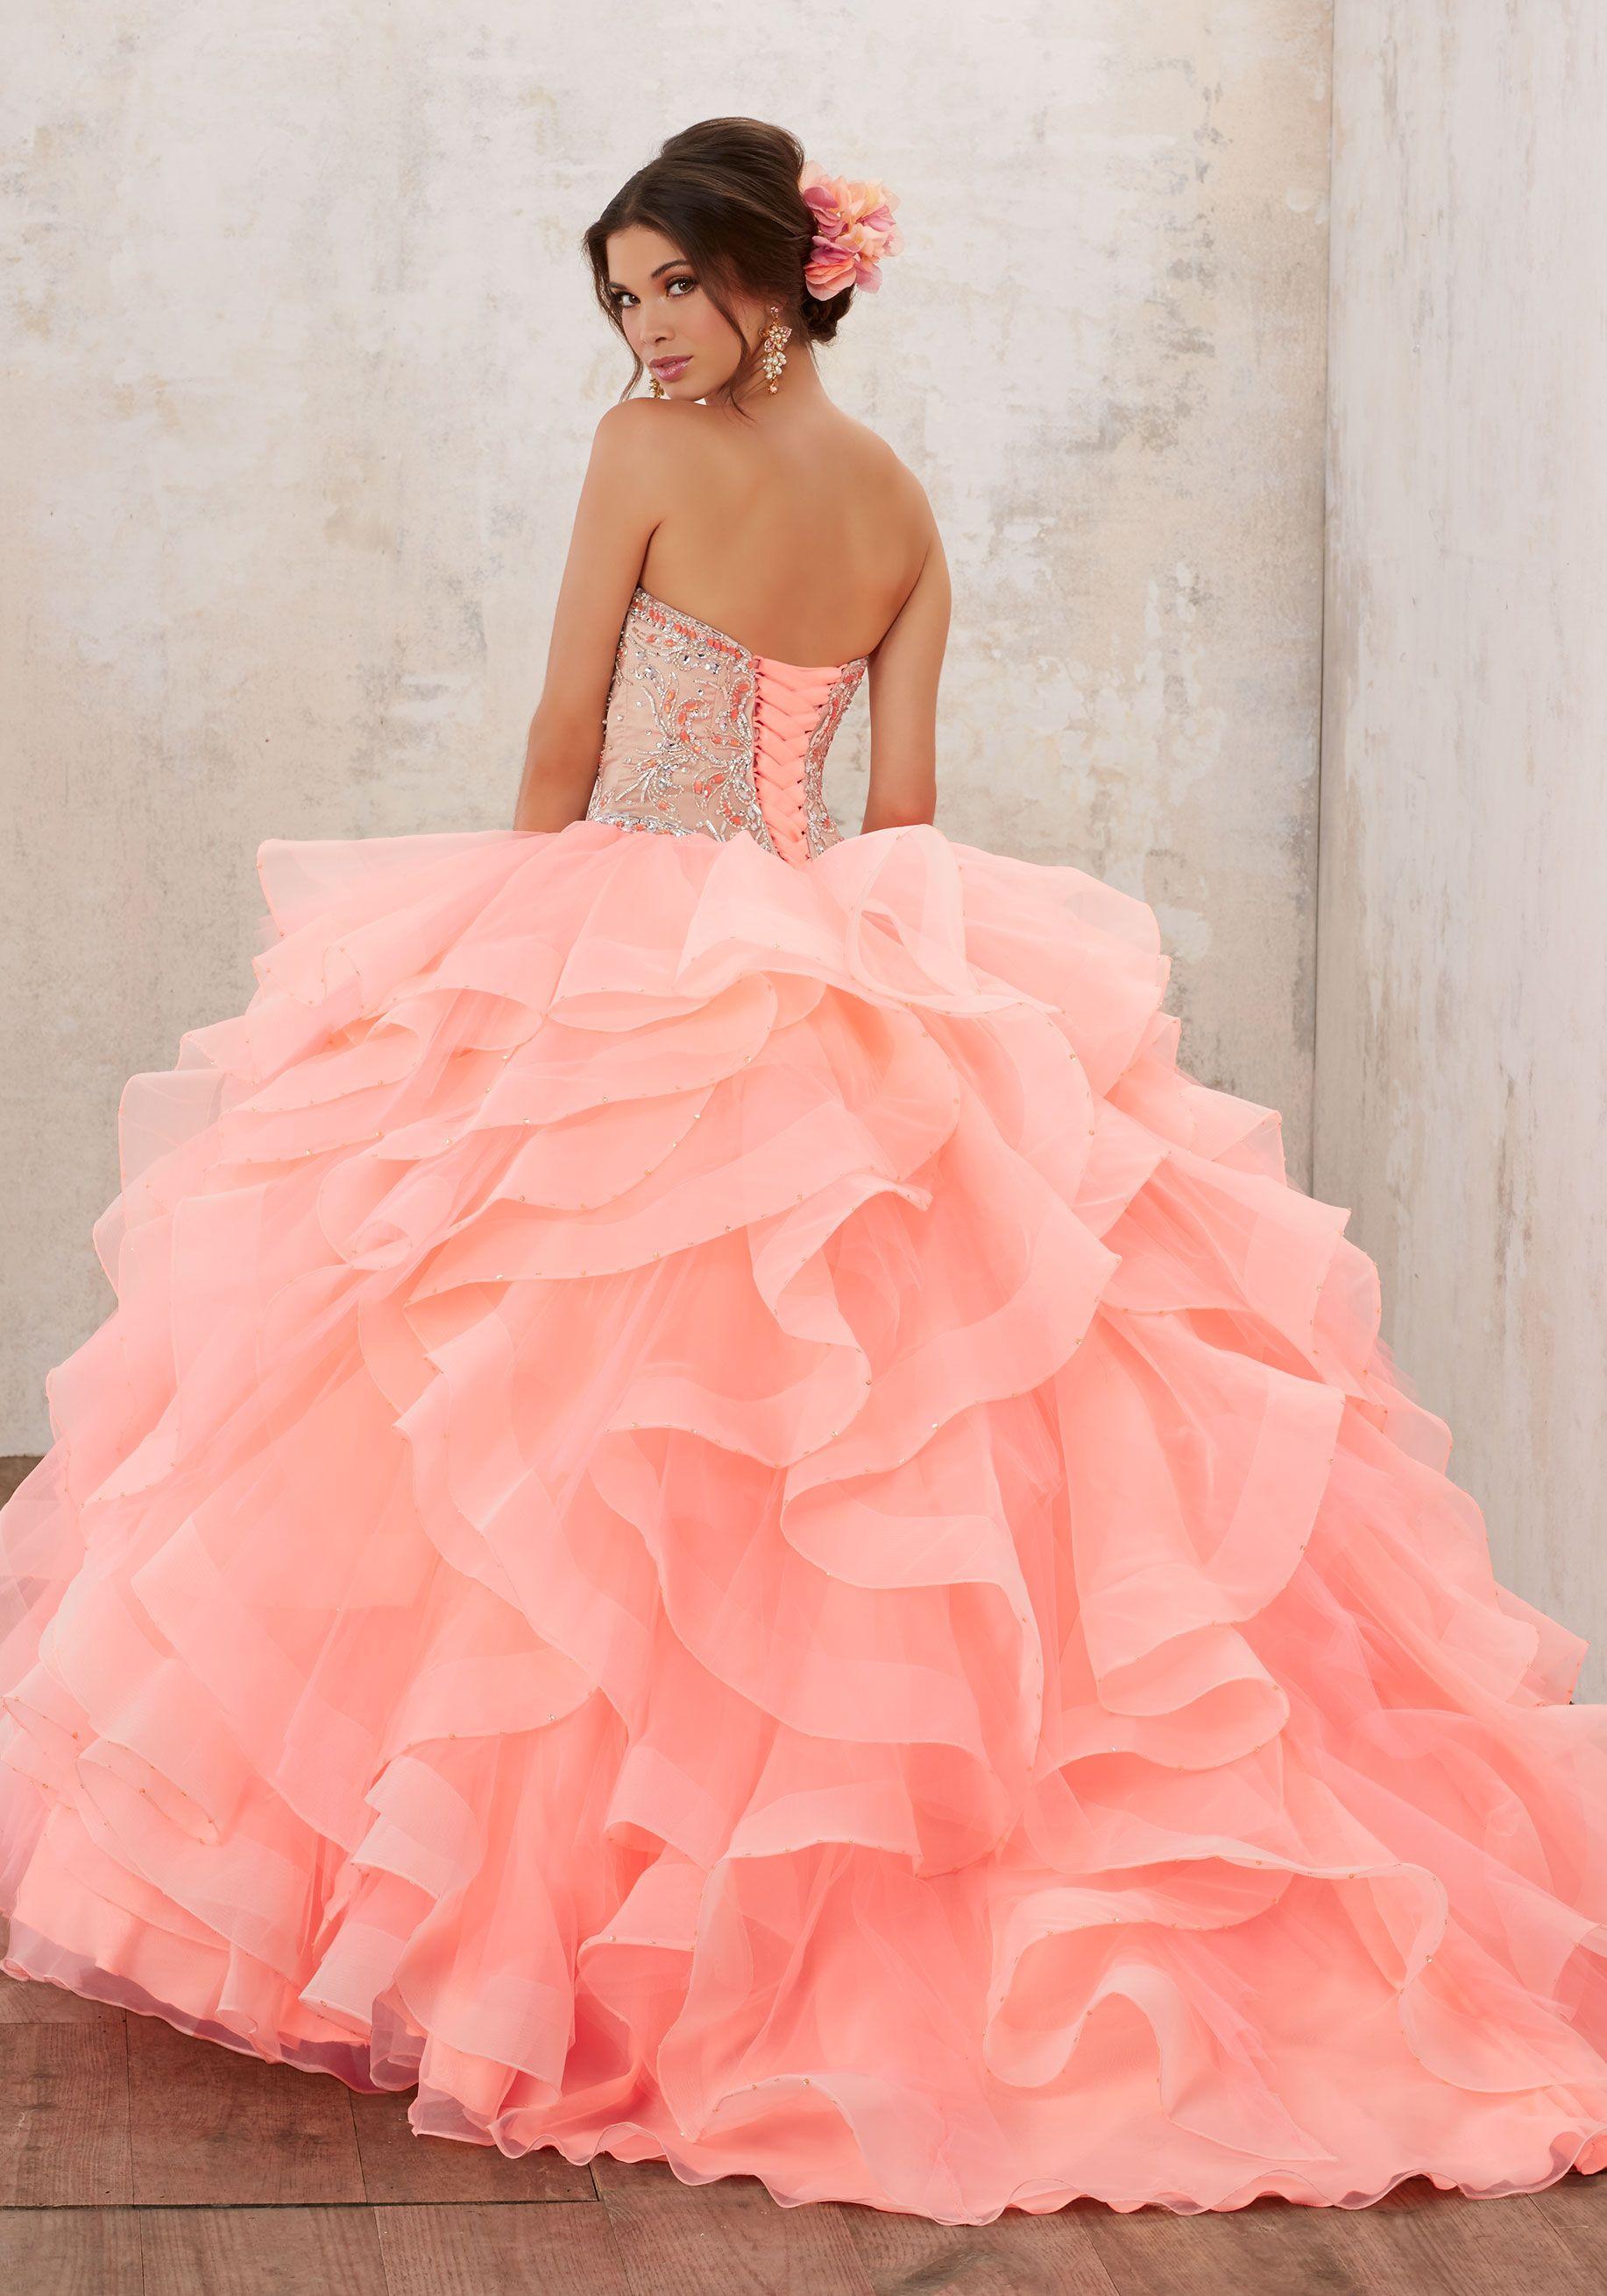 Classic quinceañera ballgown combines a stunning jewel beaded